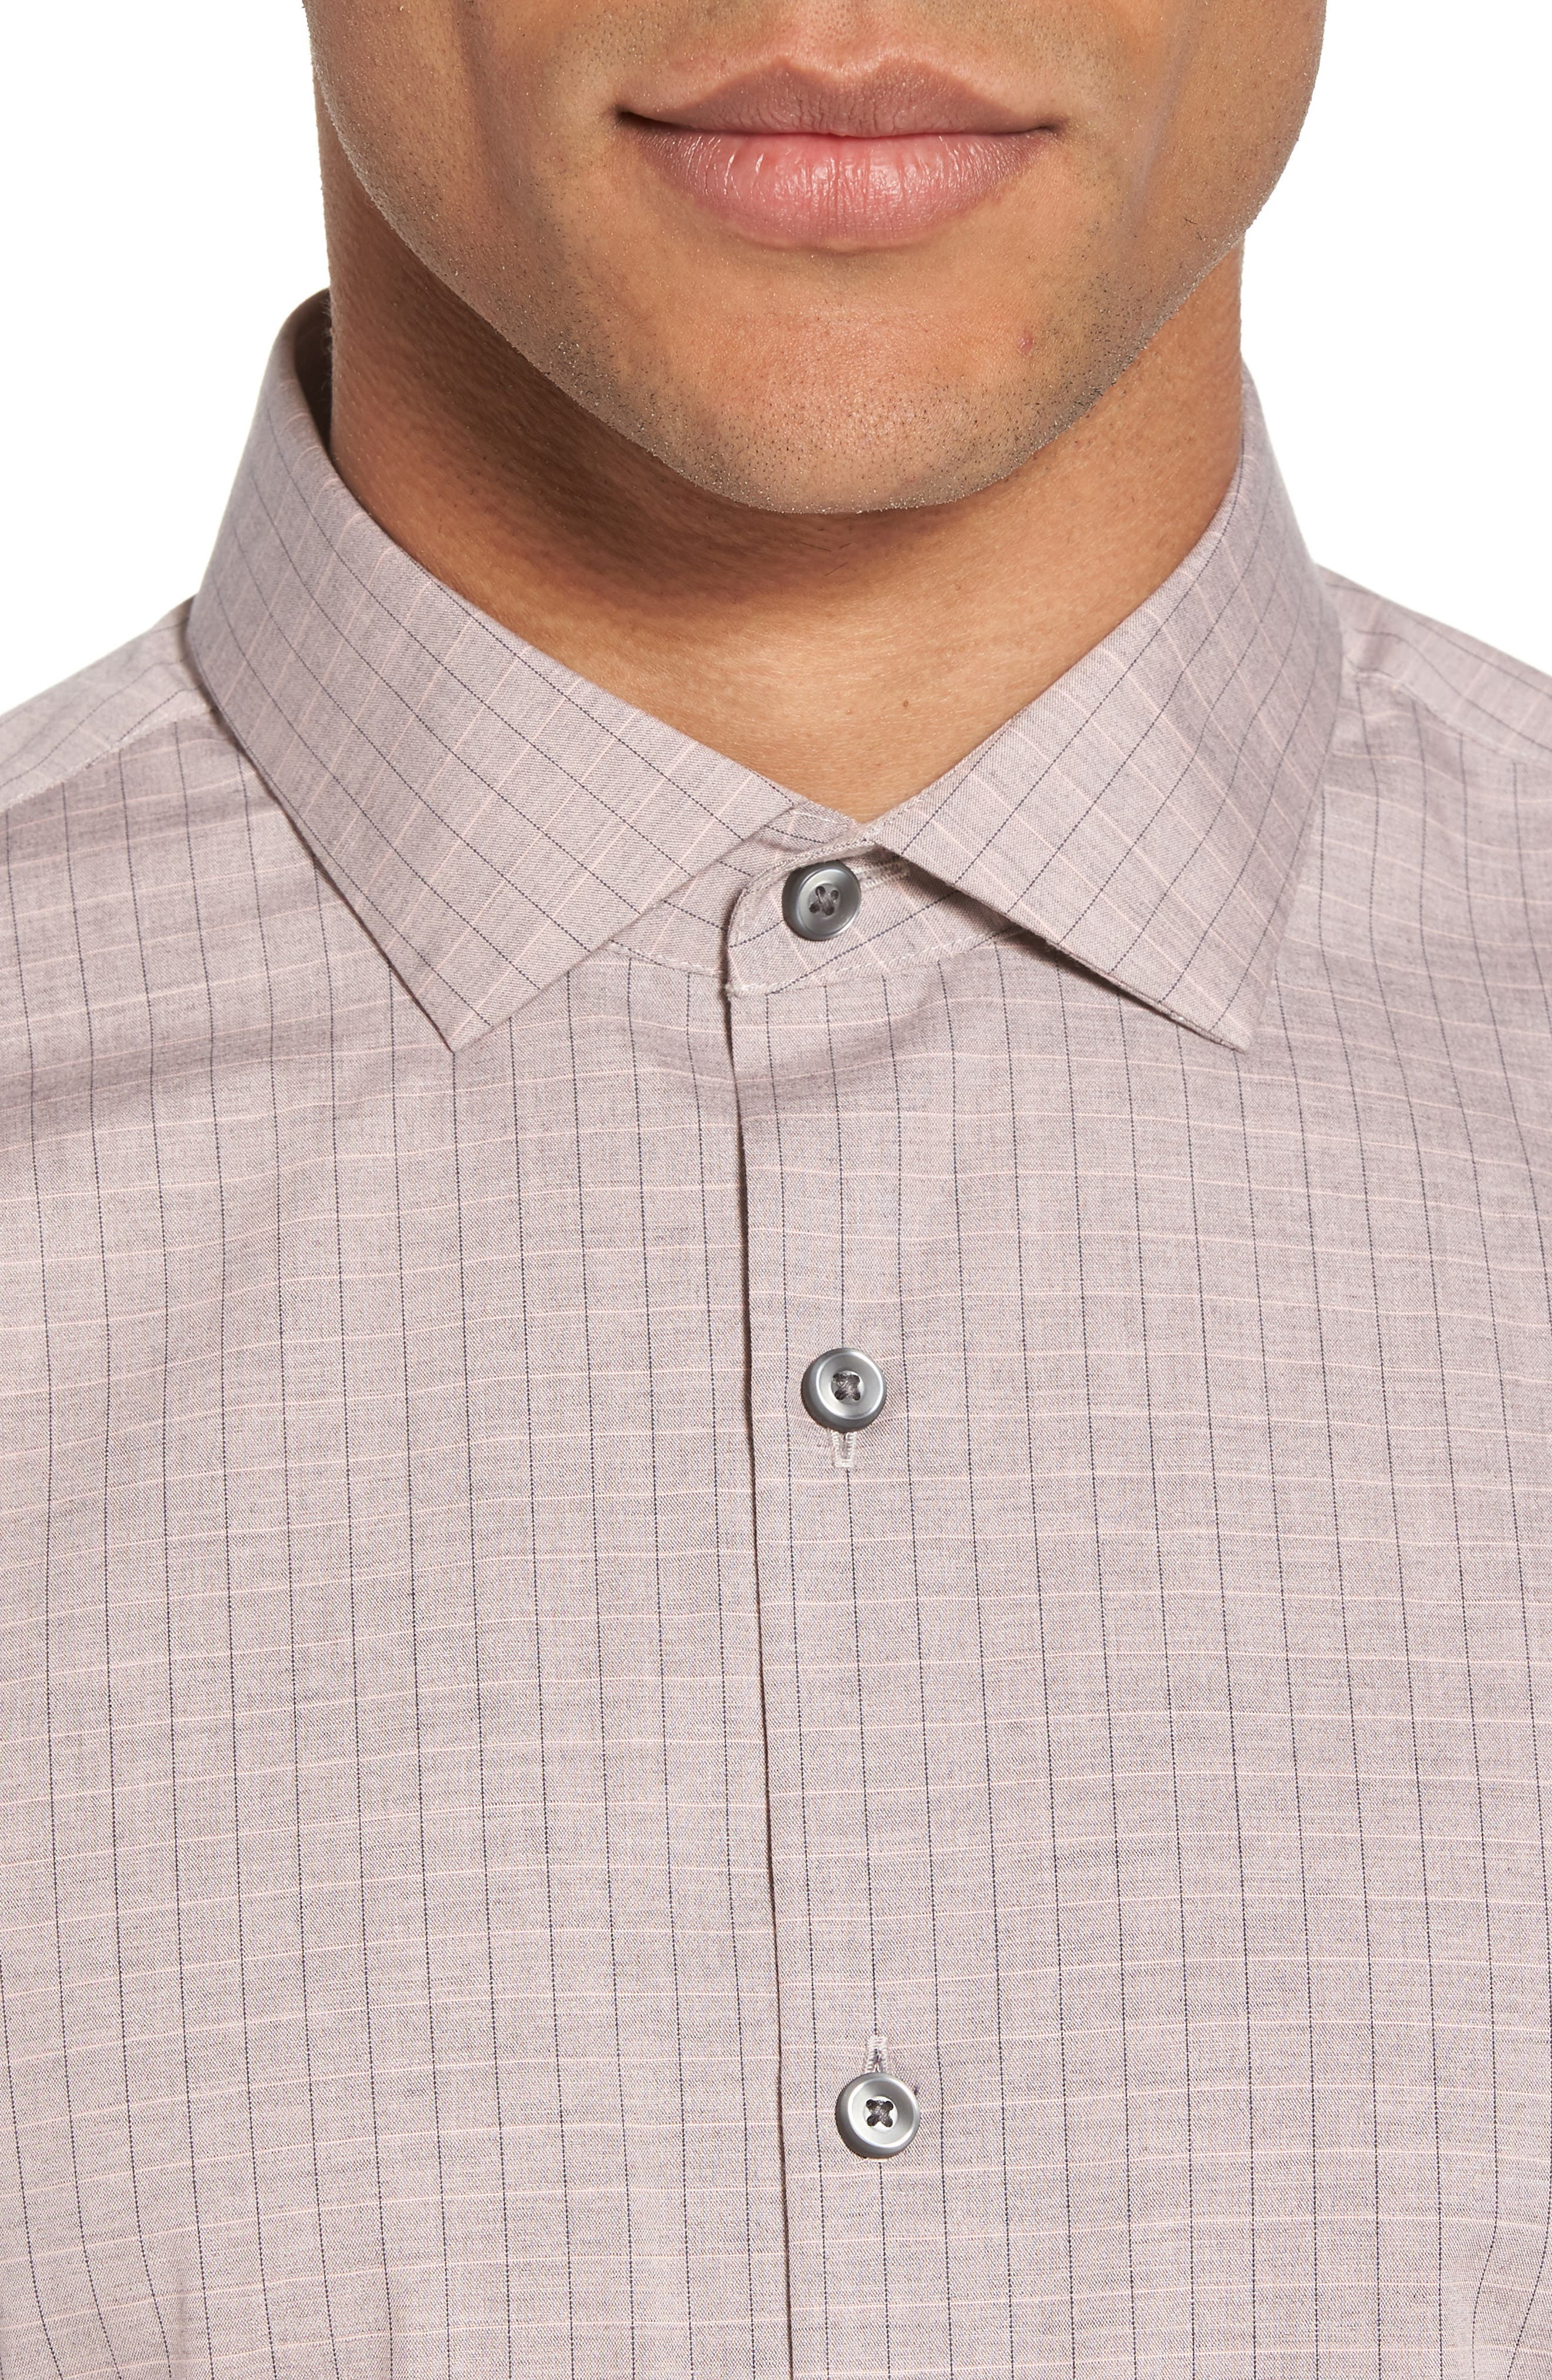 Grid Sport Shirt,                             Alternate thumbnail 4, color,                             680